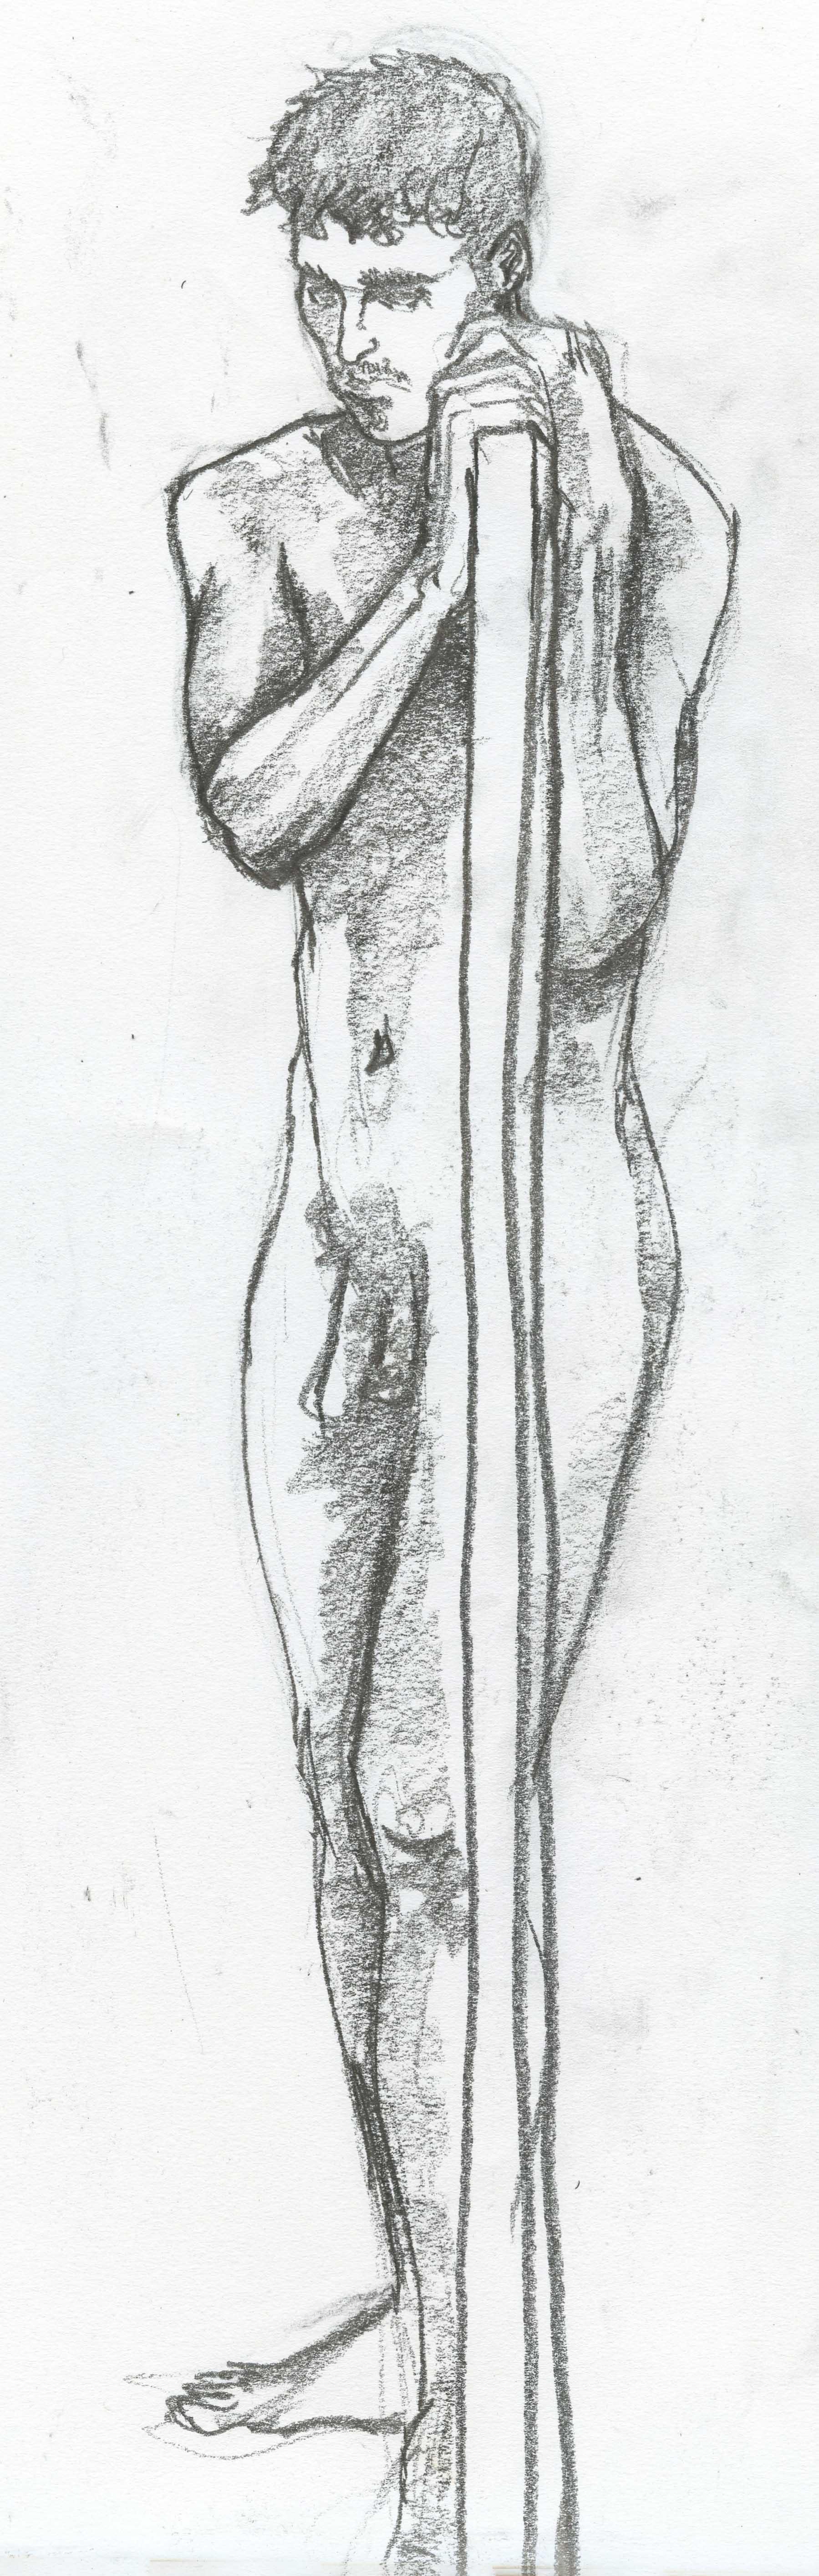 Noomis - Etudes, croquis & Wip [ Nudité ] - Page 6 160927110630476051